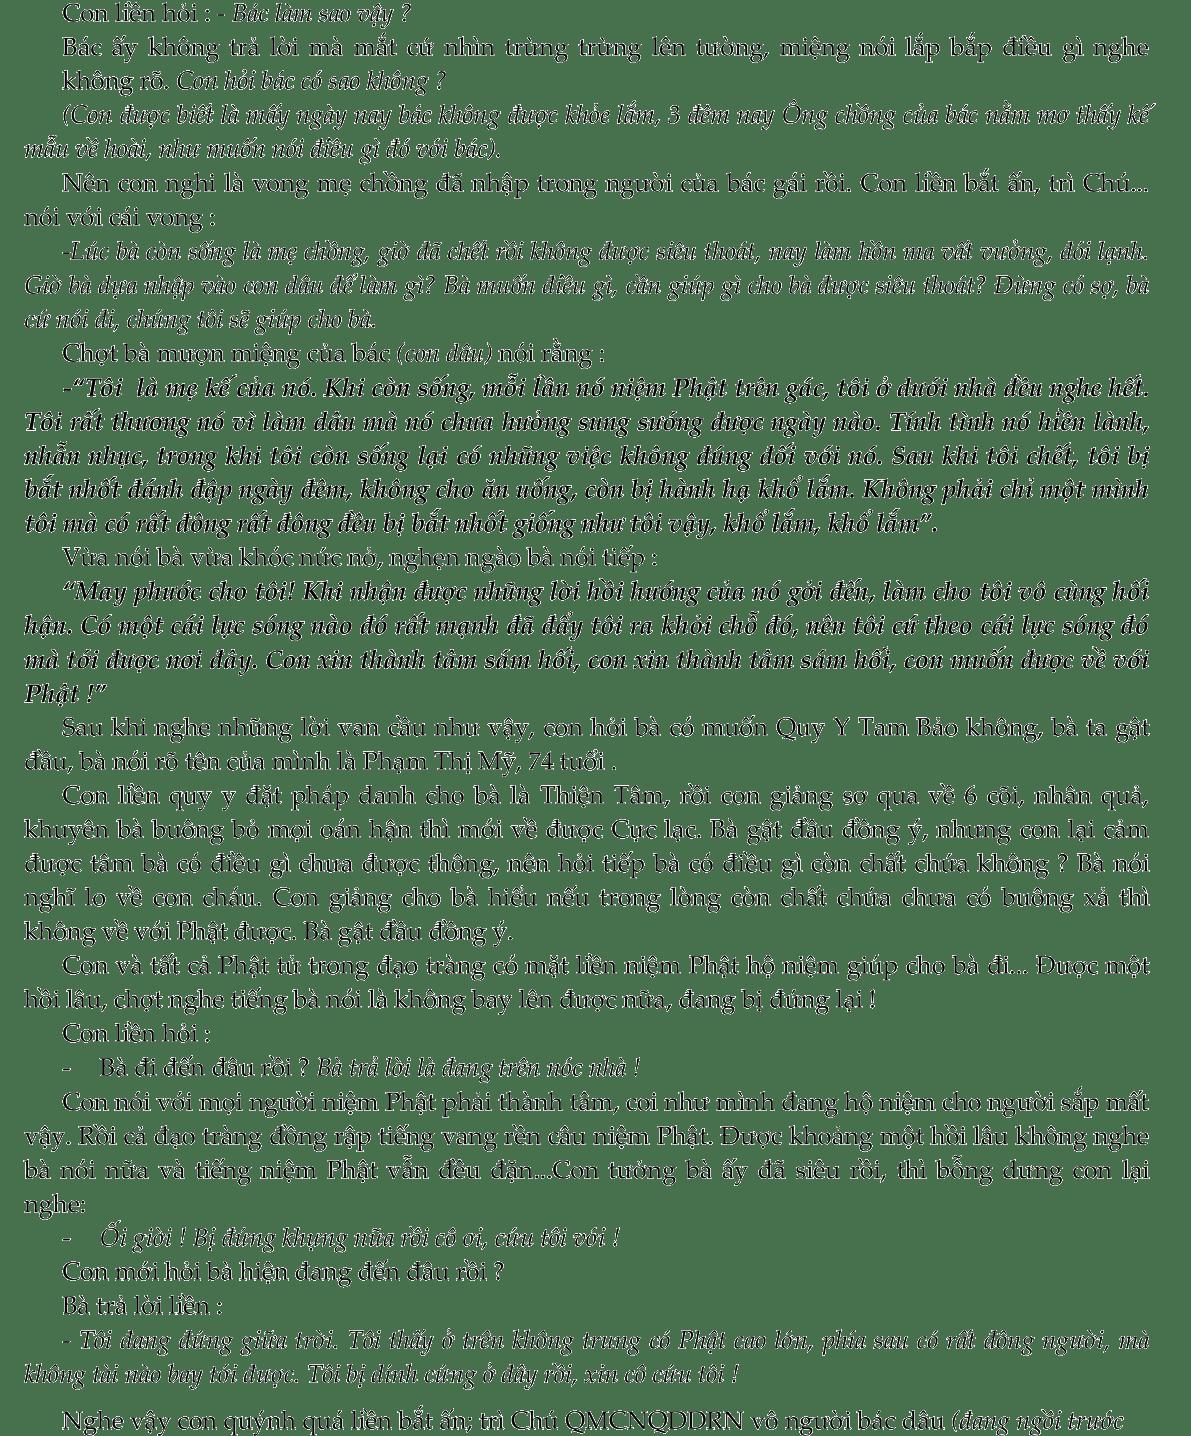 C:\Users\kimtl\Desktop\thu phat hoc hinh\95-2.png